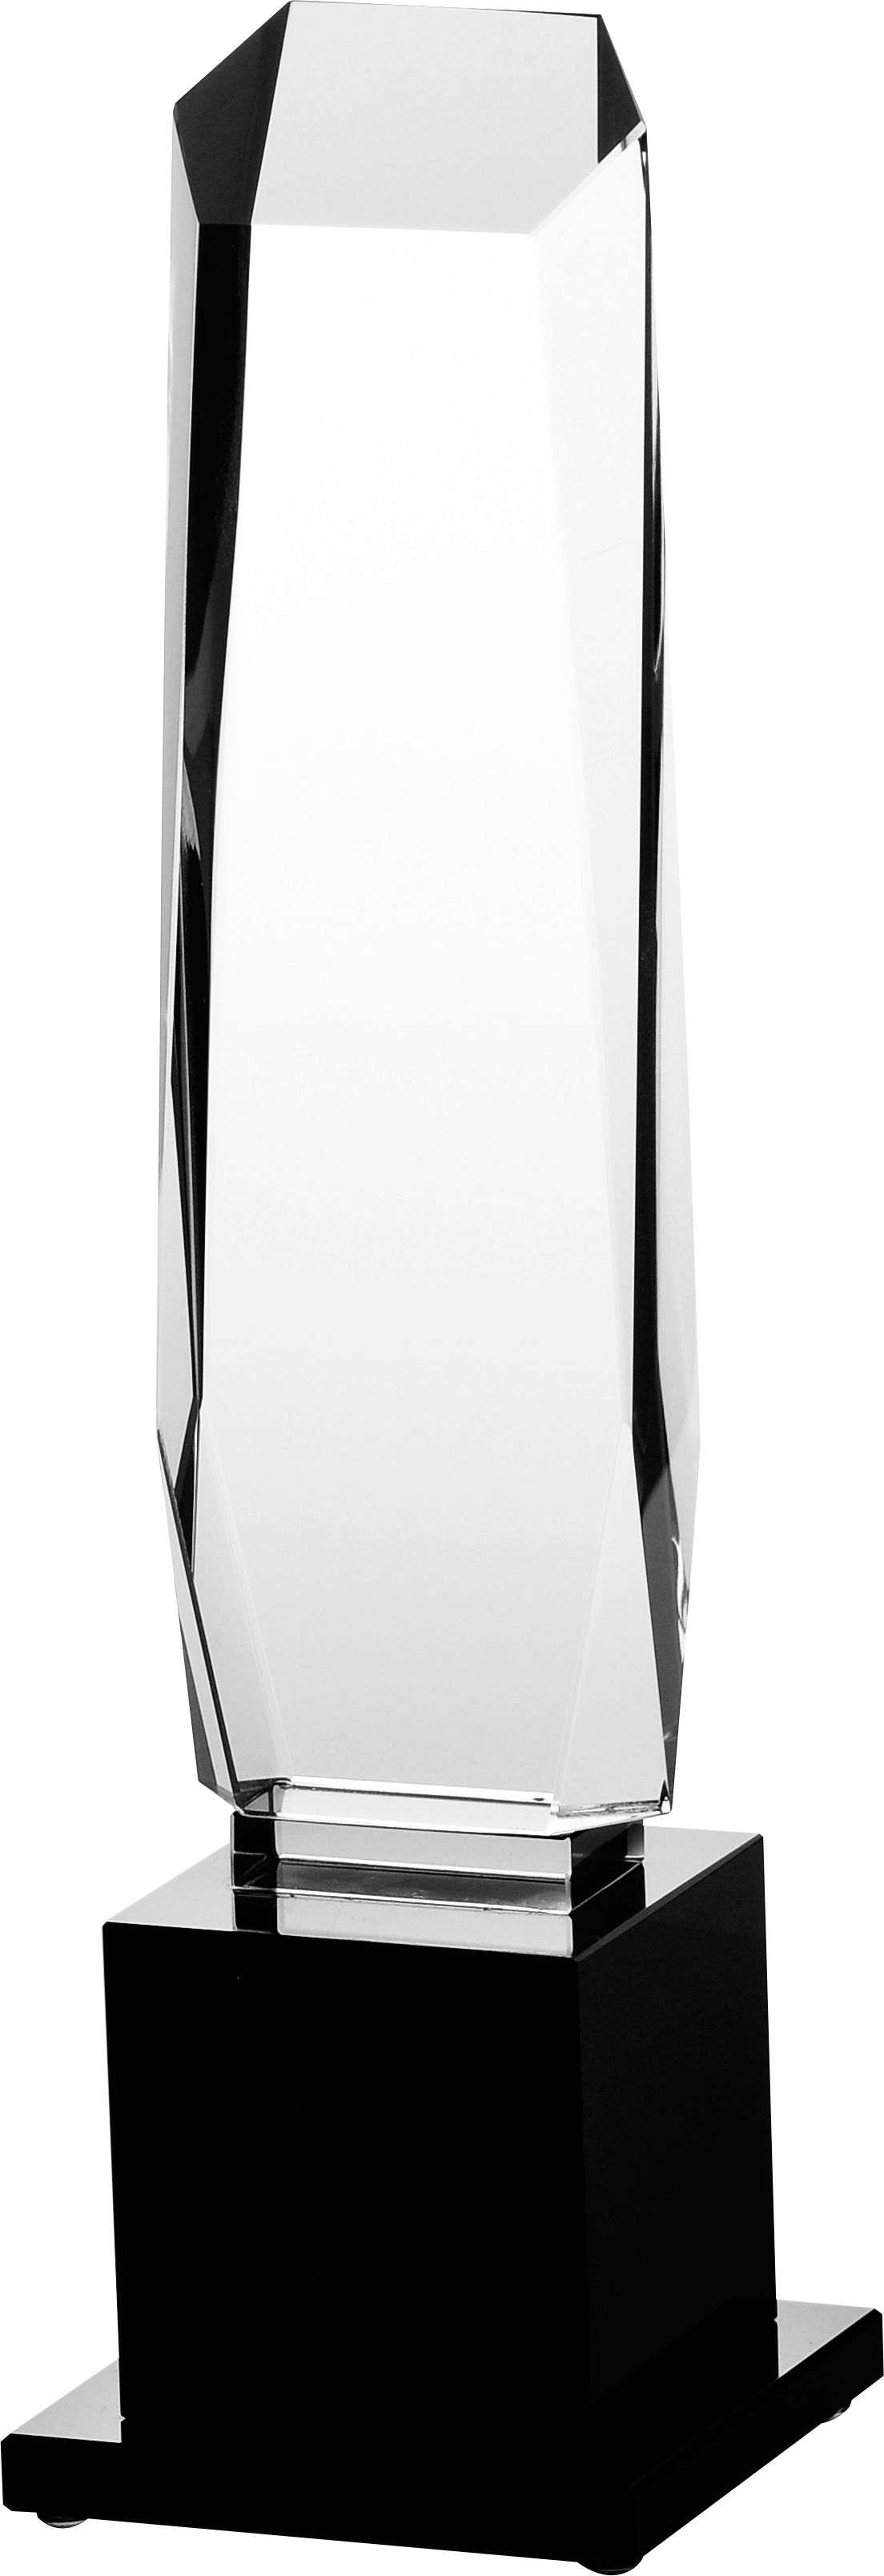 Szklana statuetka C005a, C005b, C005c